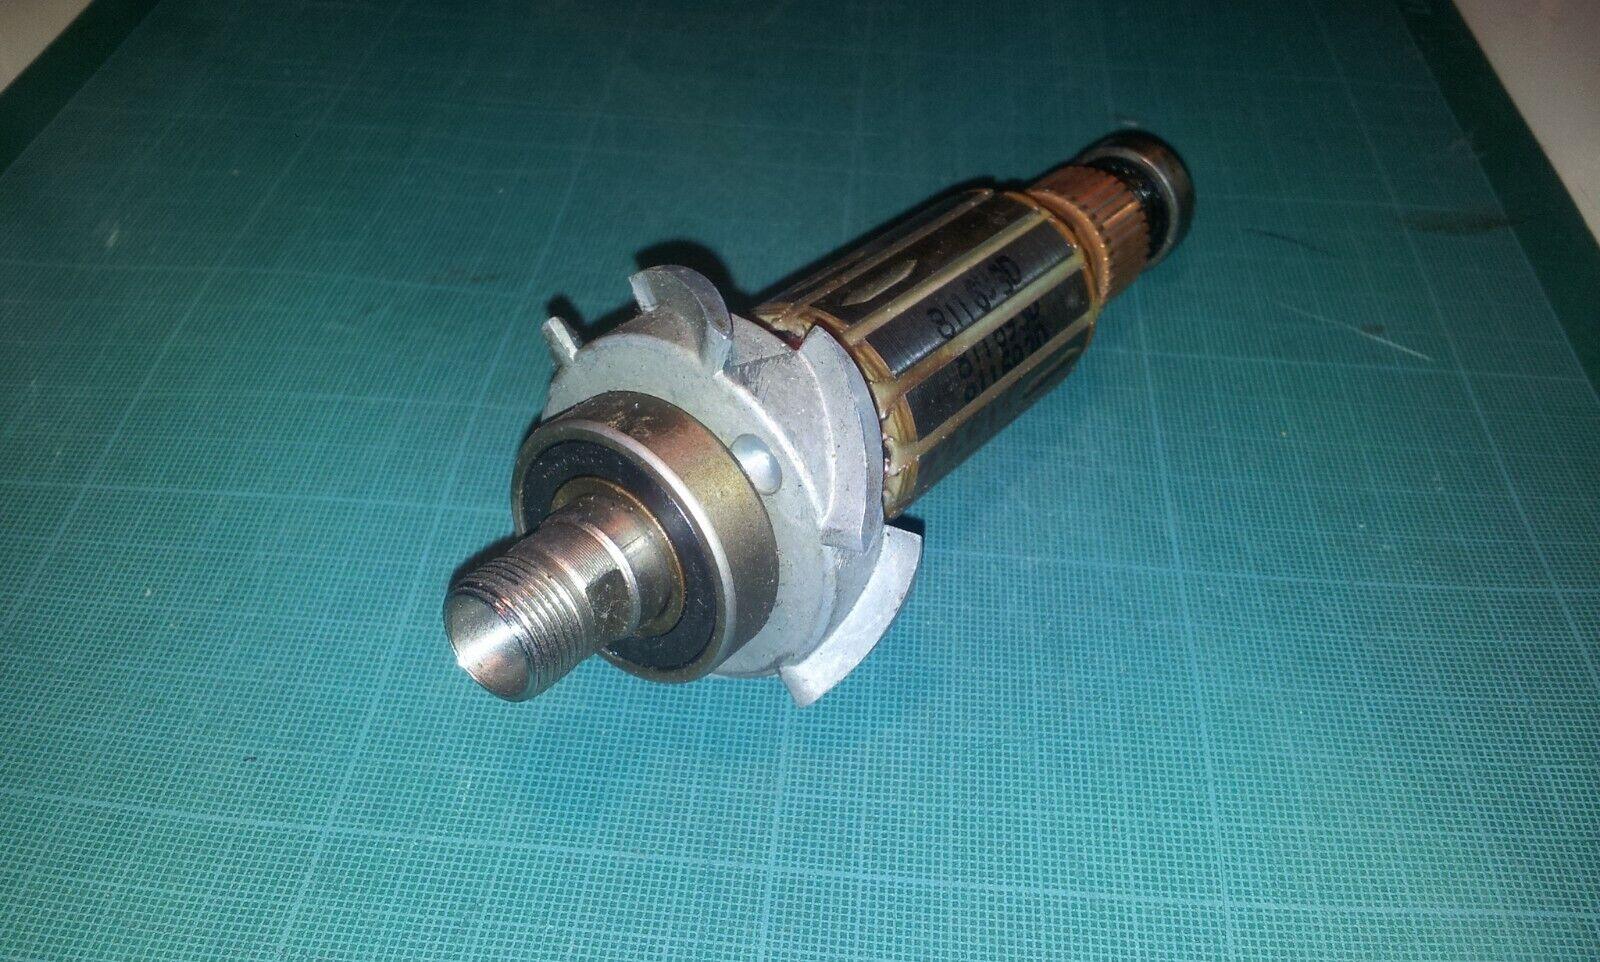 Armature cm Anker, Rotor Motor for ORIGINAL MAKITA ROUTER 3700B  220-240V